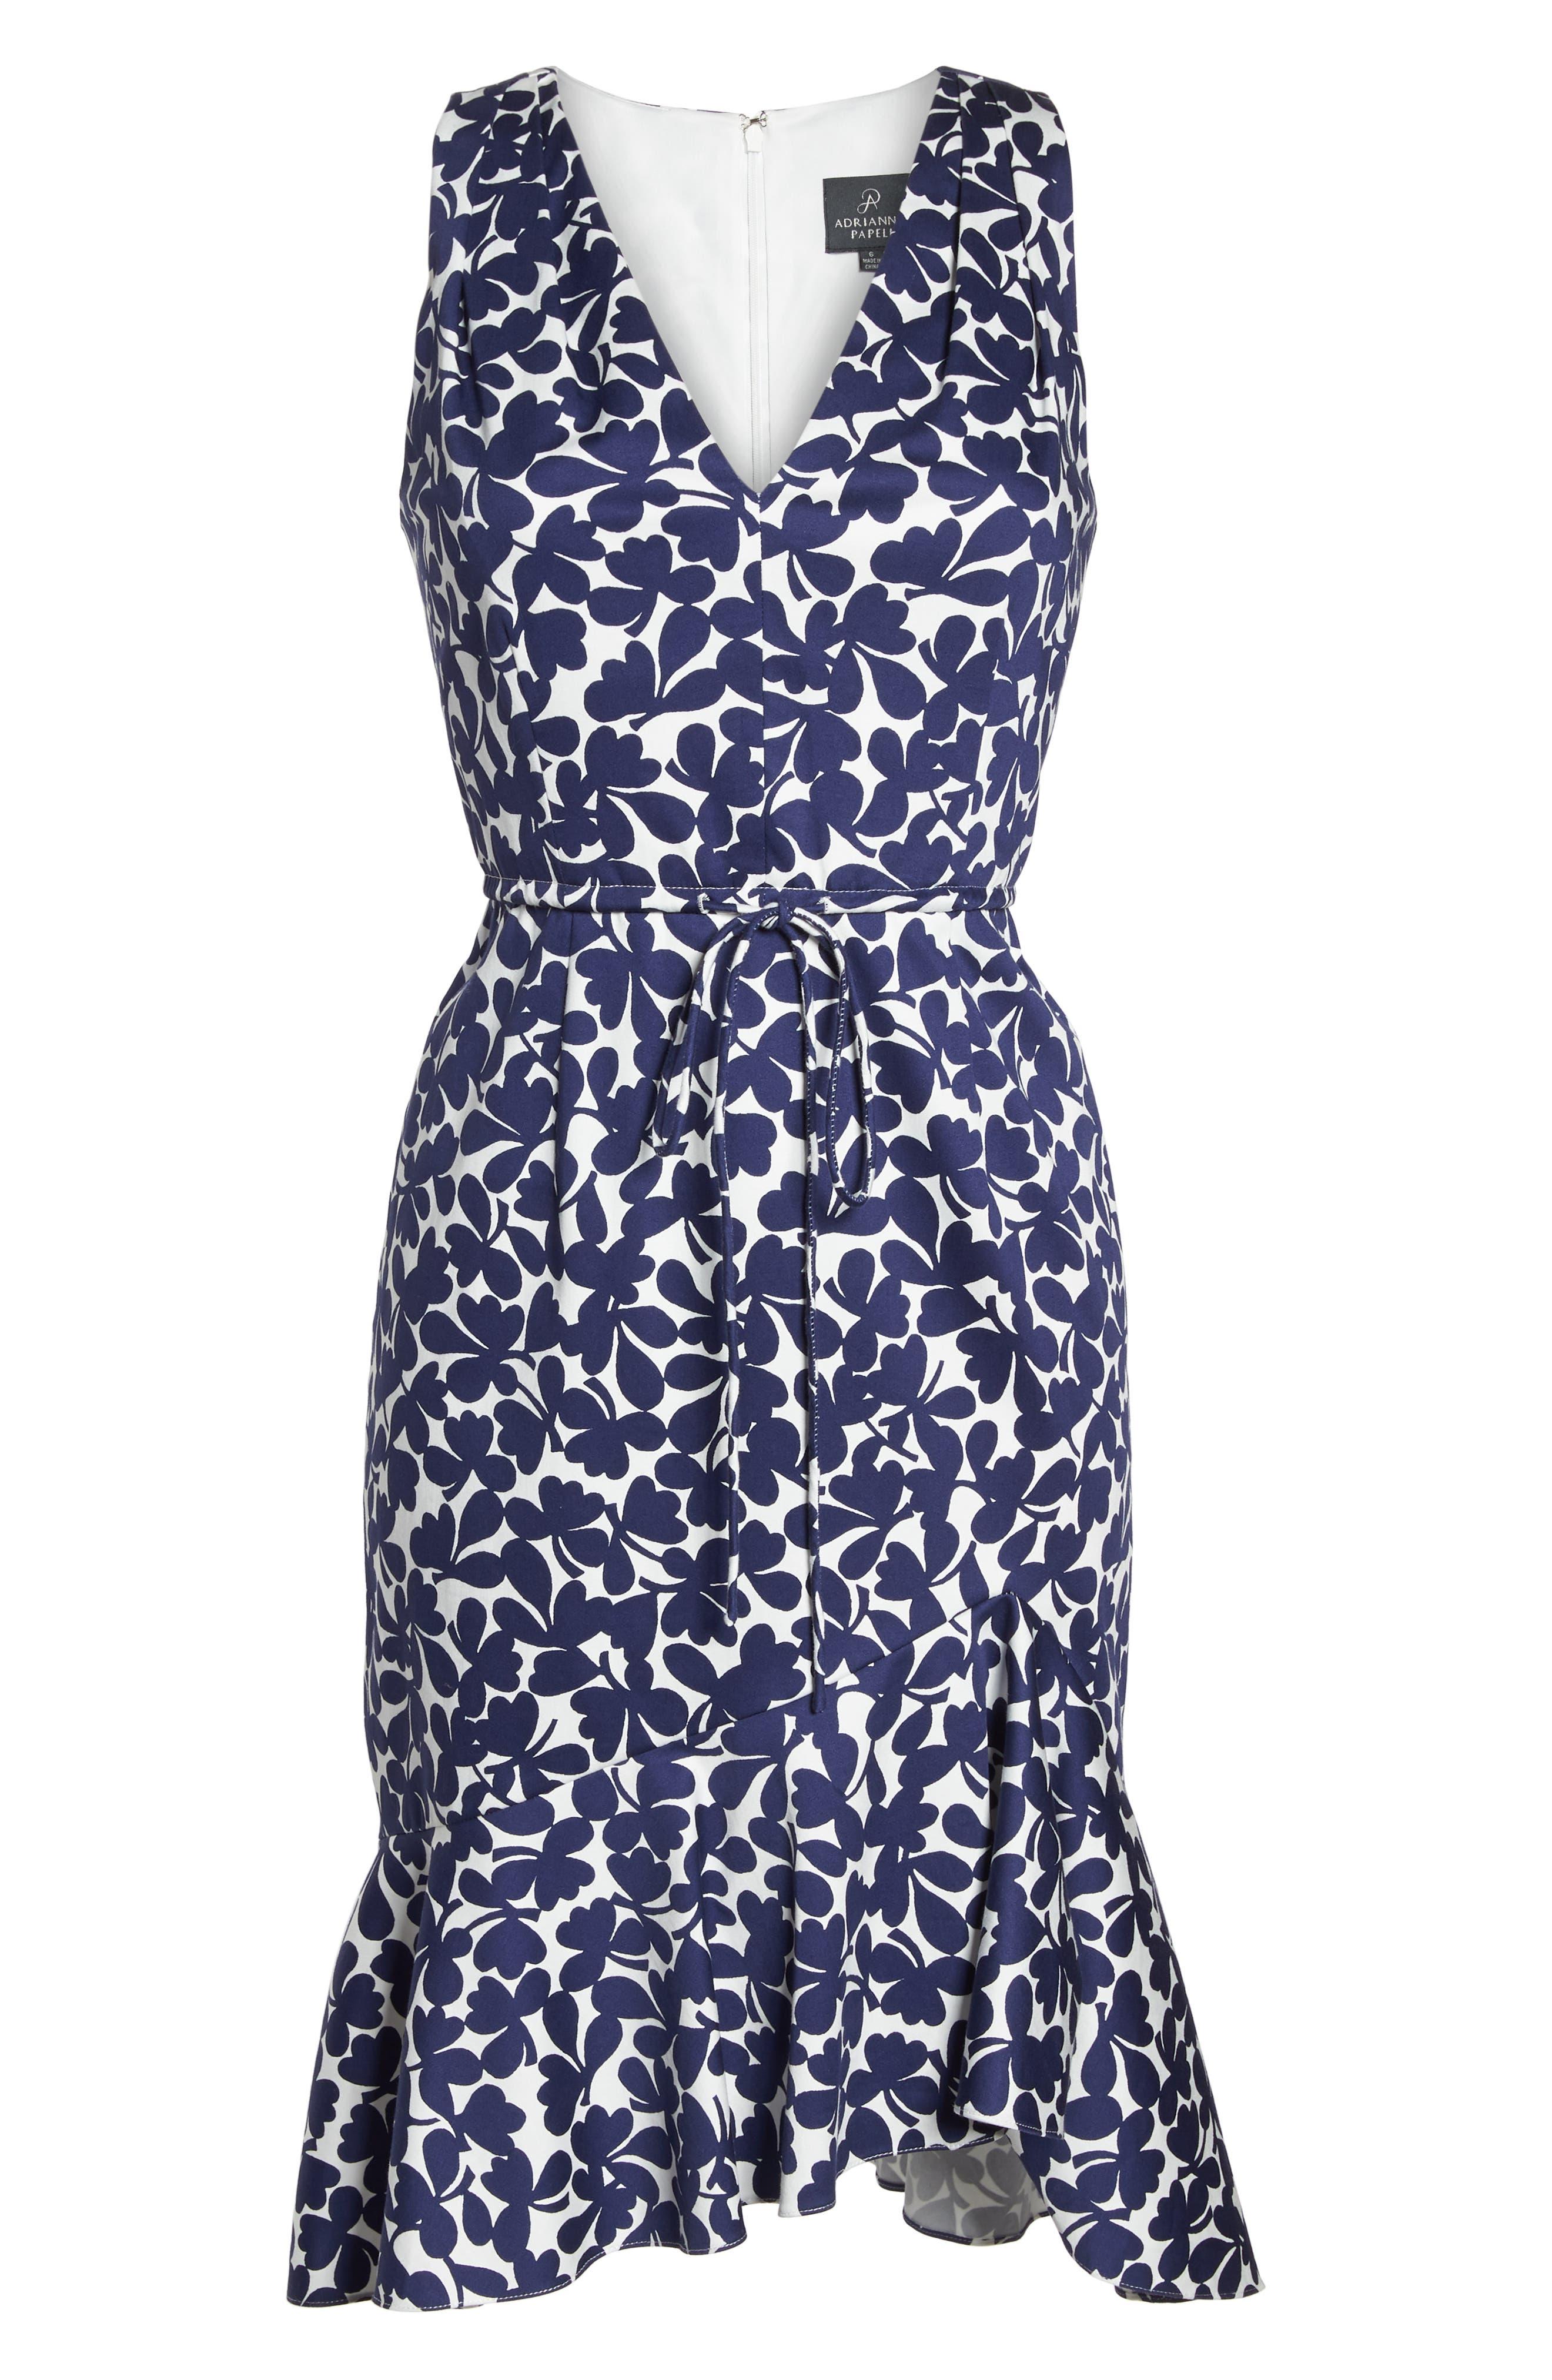 Lady Luck Print Cotton Sateen Dress,                             Alternate thumbnail 7, color,                             488